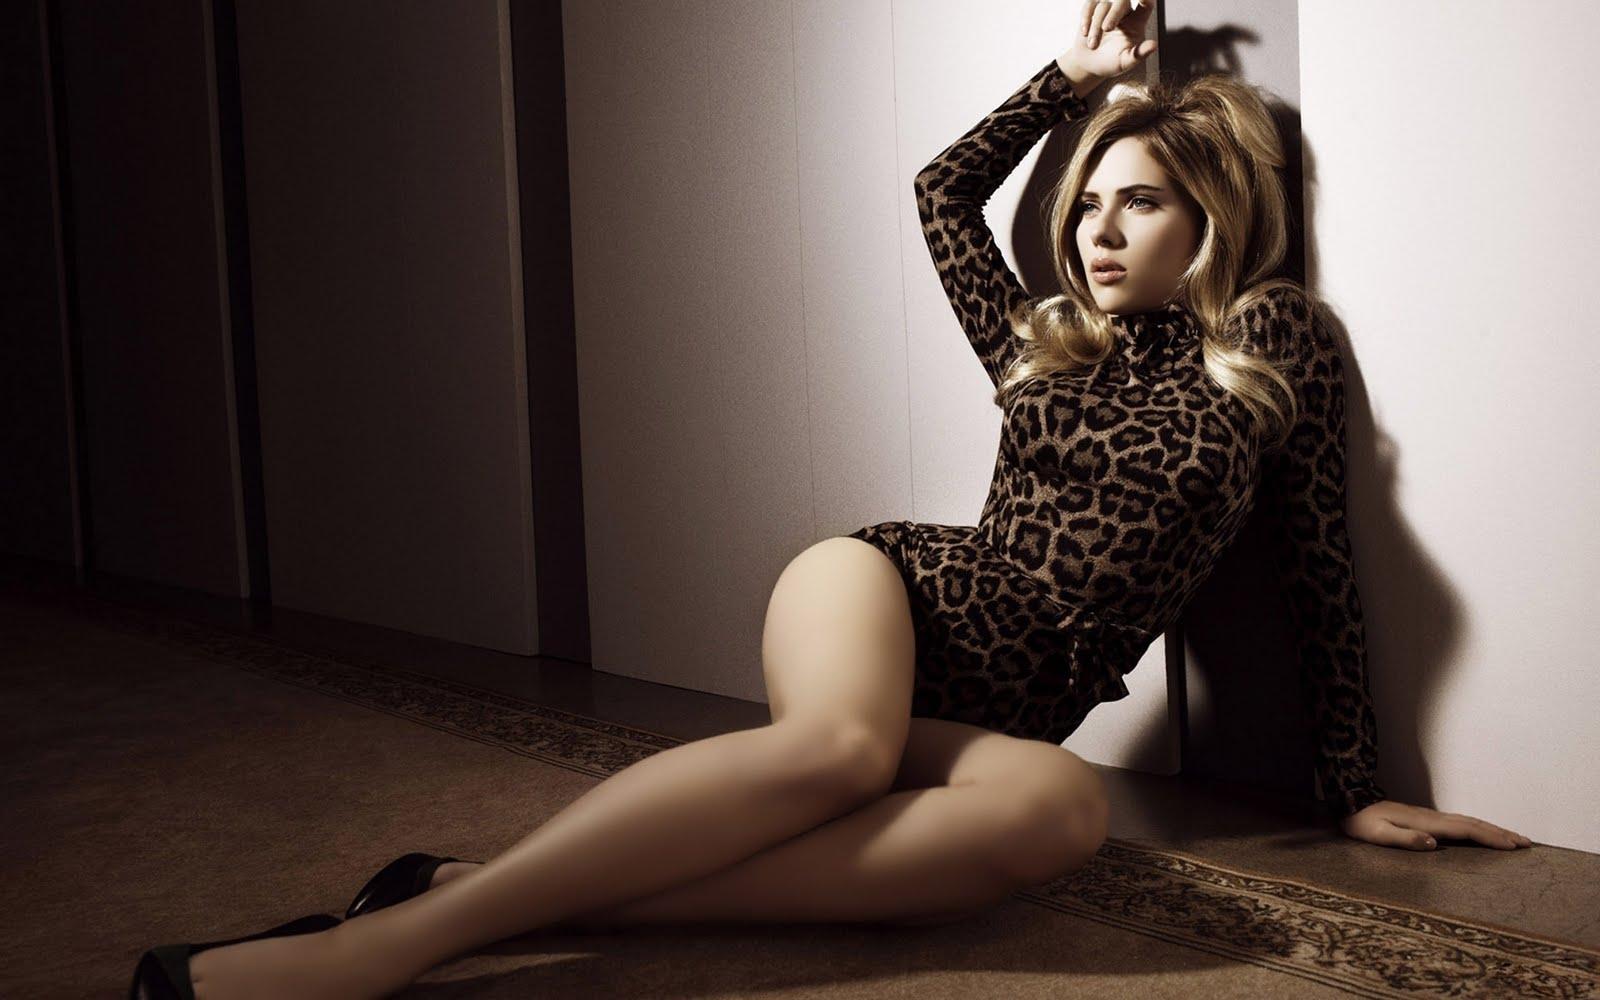 http://2.bp.blogspot.com/-FCE5VNPwWTA/TjUTo0vh2MI/AAAAAAAACKg/IHYVOyQ5rNU/s1600/sensual-scarlett-hd-wallpaper.jpg